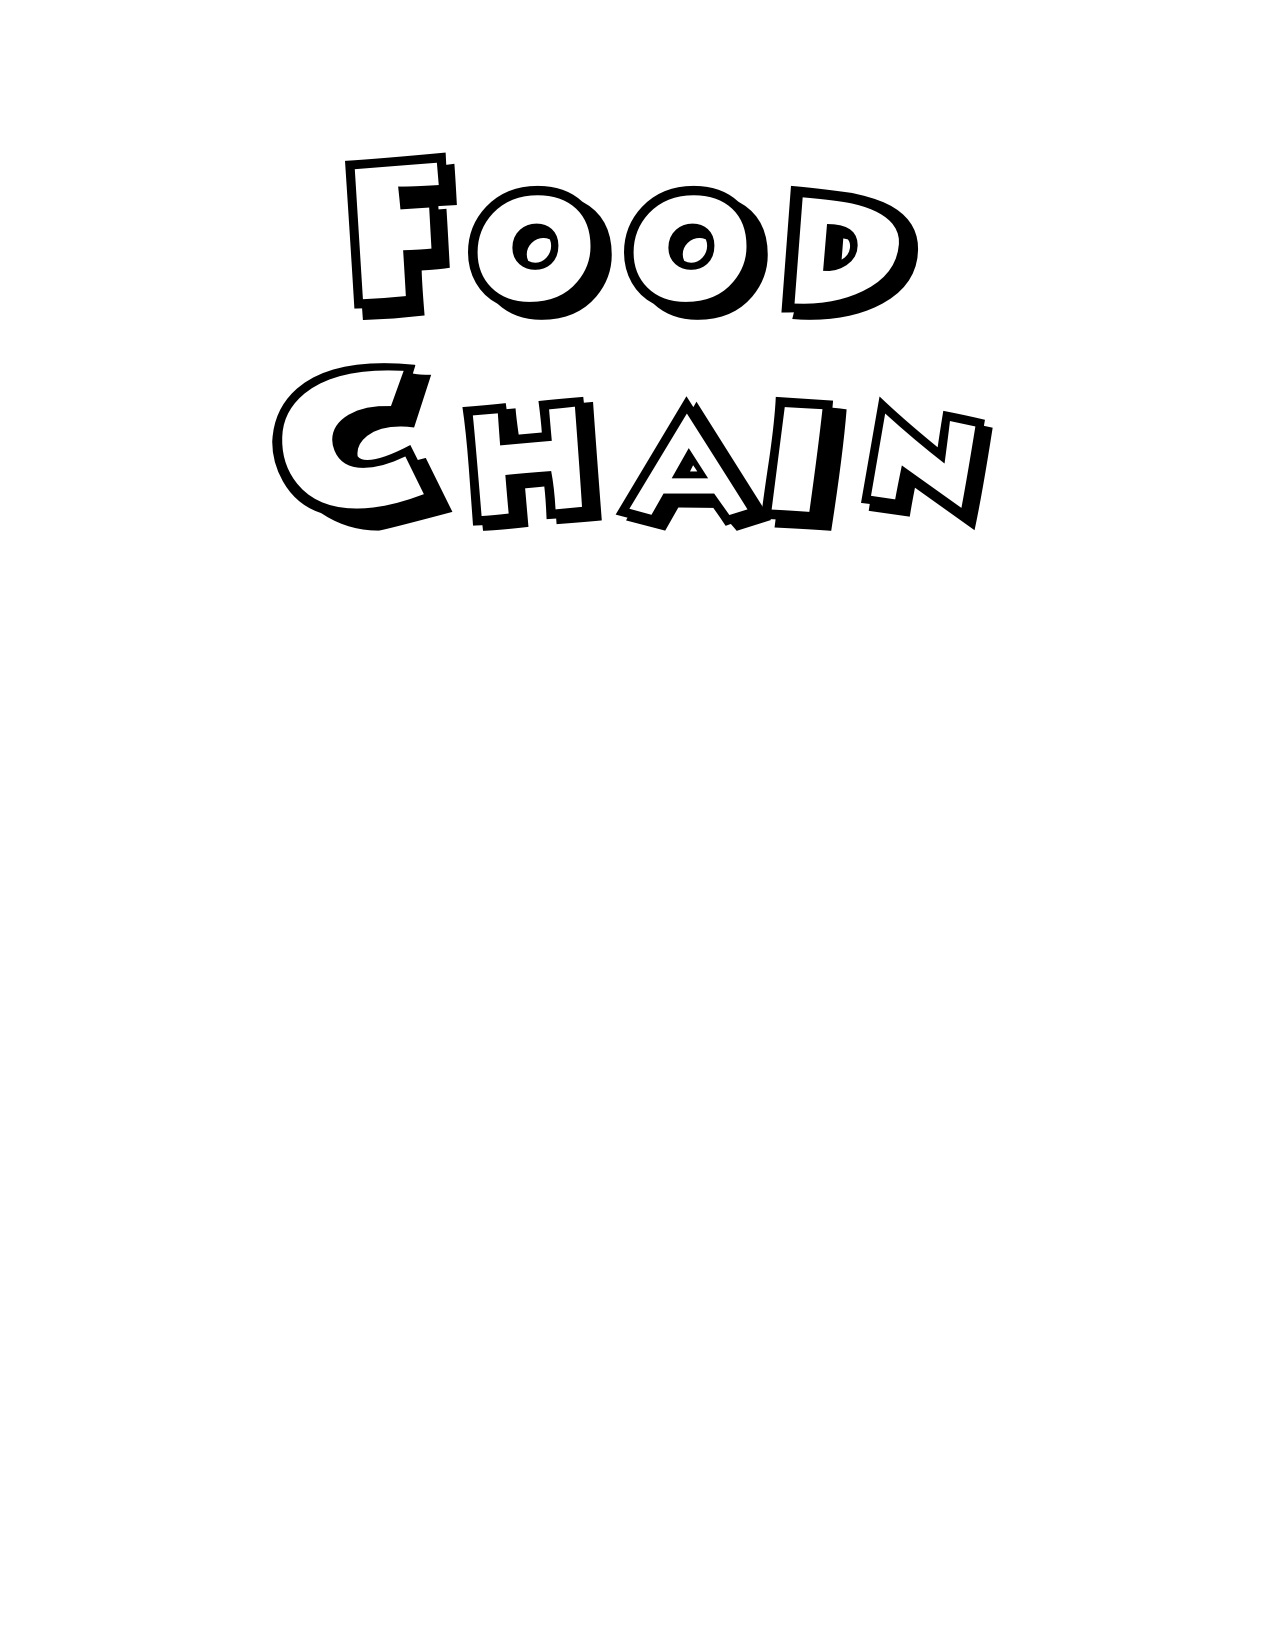 9 Best Images Of Food Chain Worksheets For Kindergarten